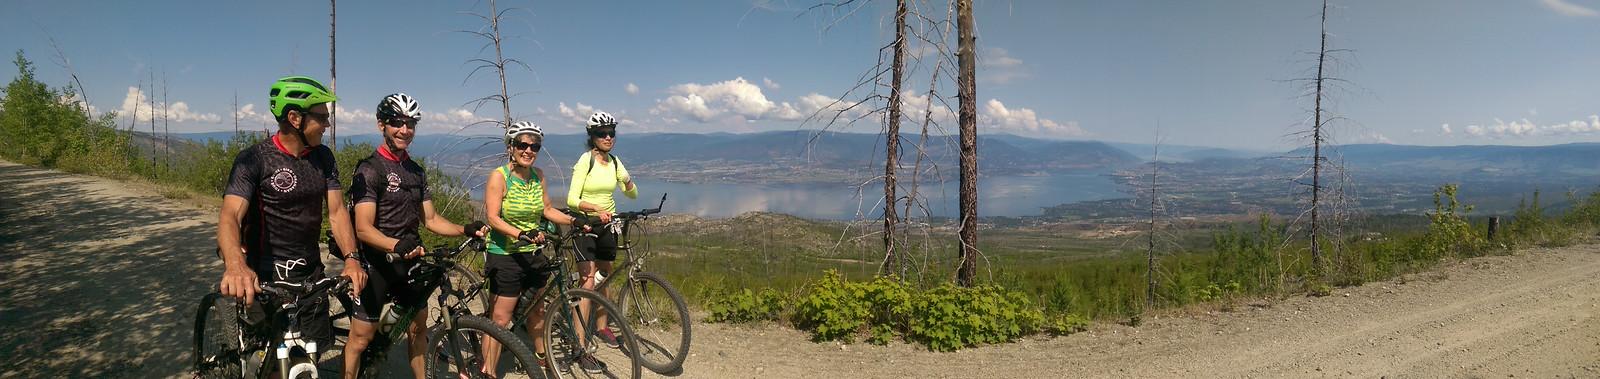 Ride the KVR from Myra to Naramata   Discover historic adventure